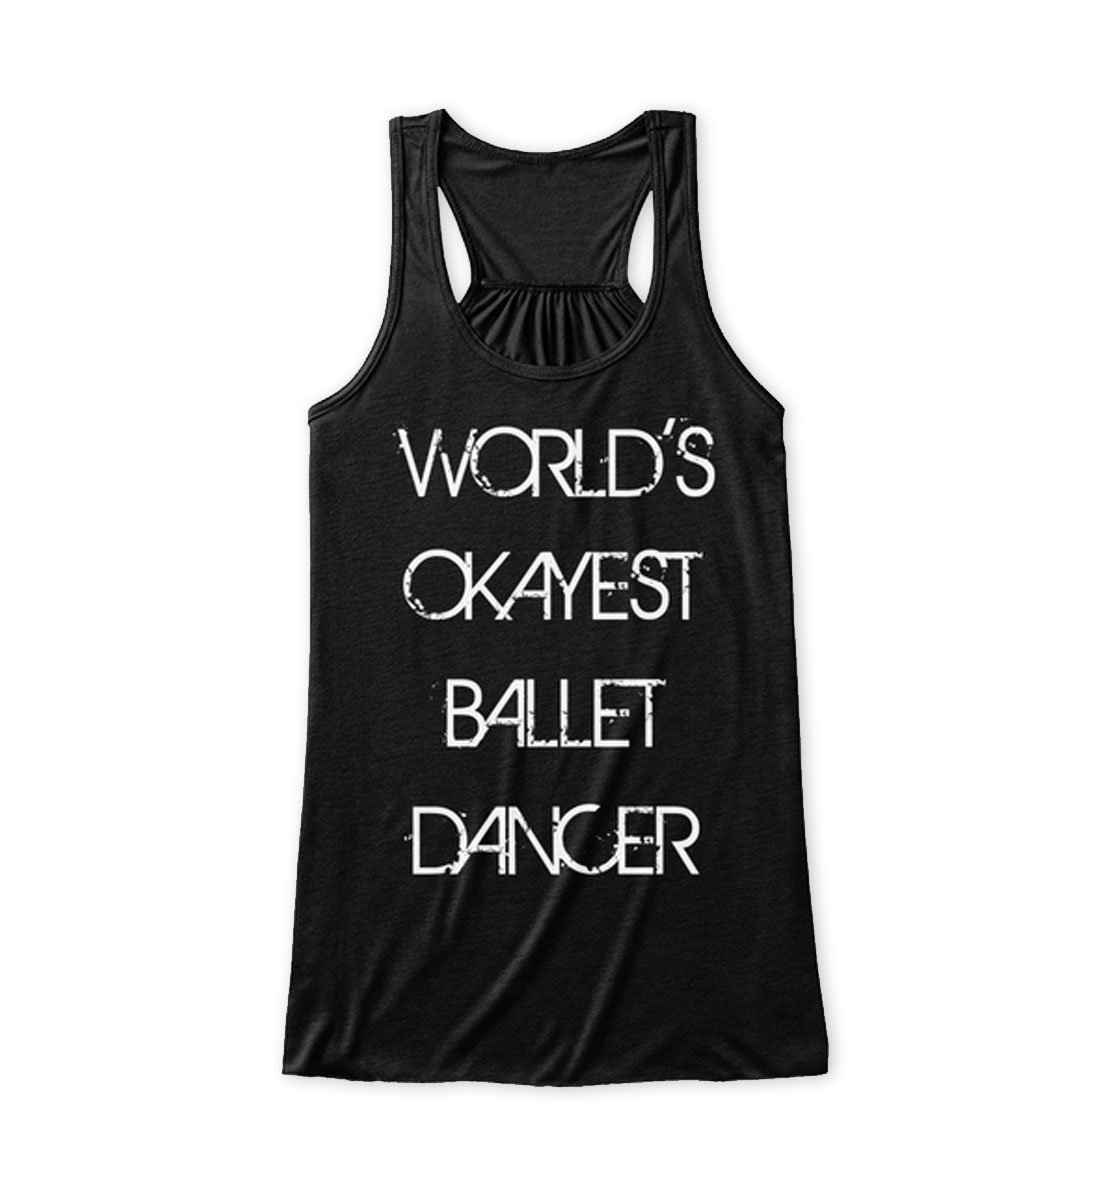 worlds-okayest-ballet-dancer-womens-flowy-tank-top-black